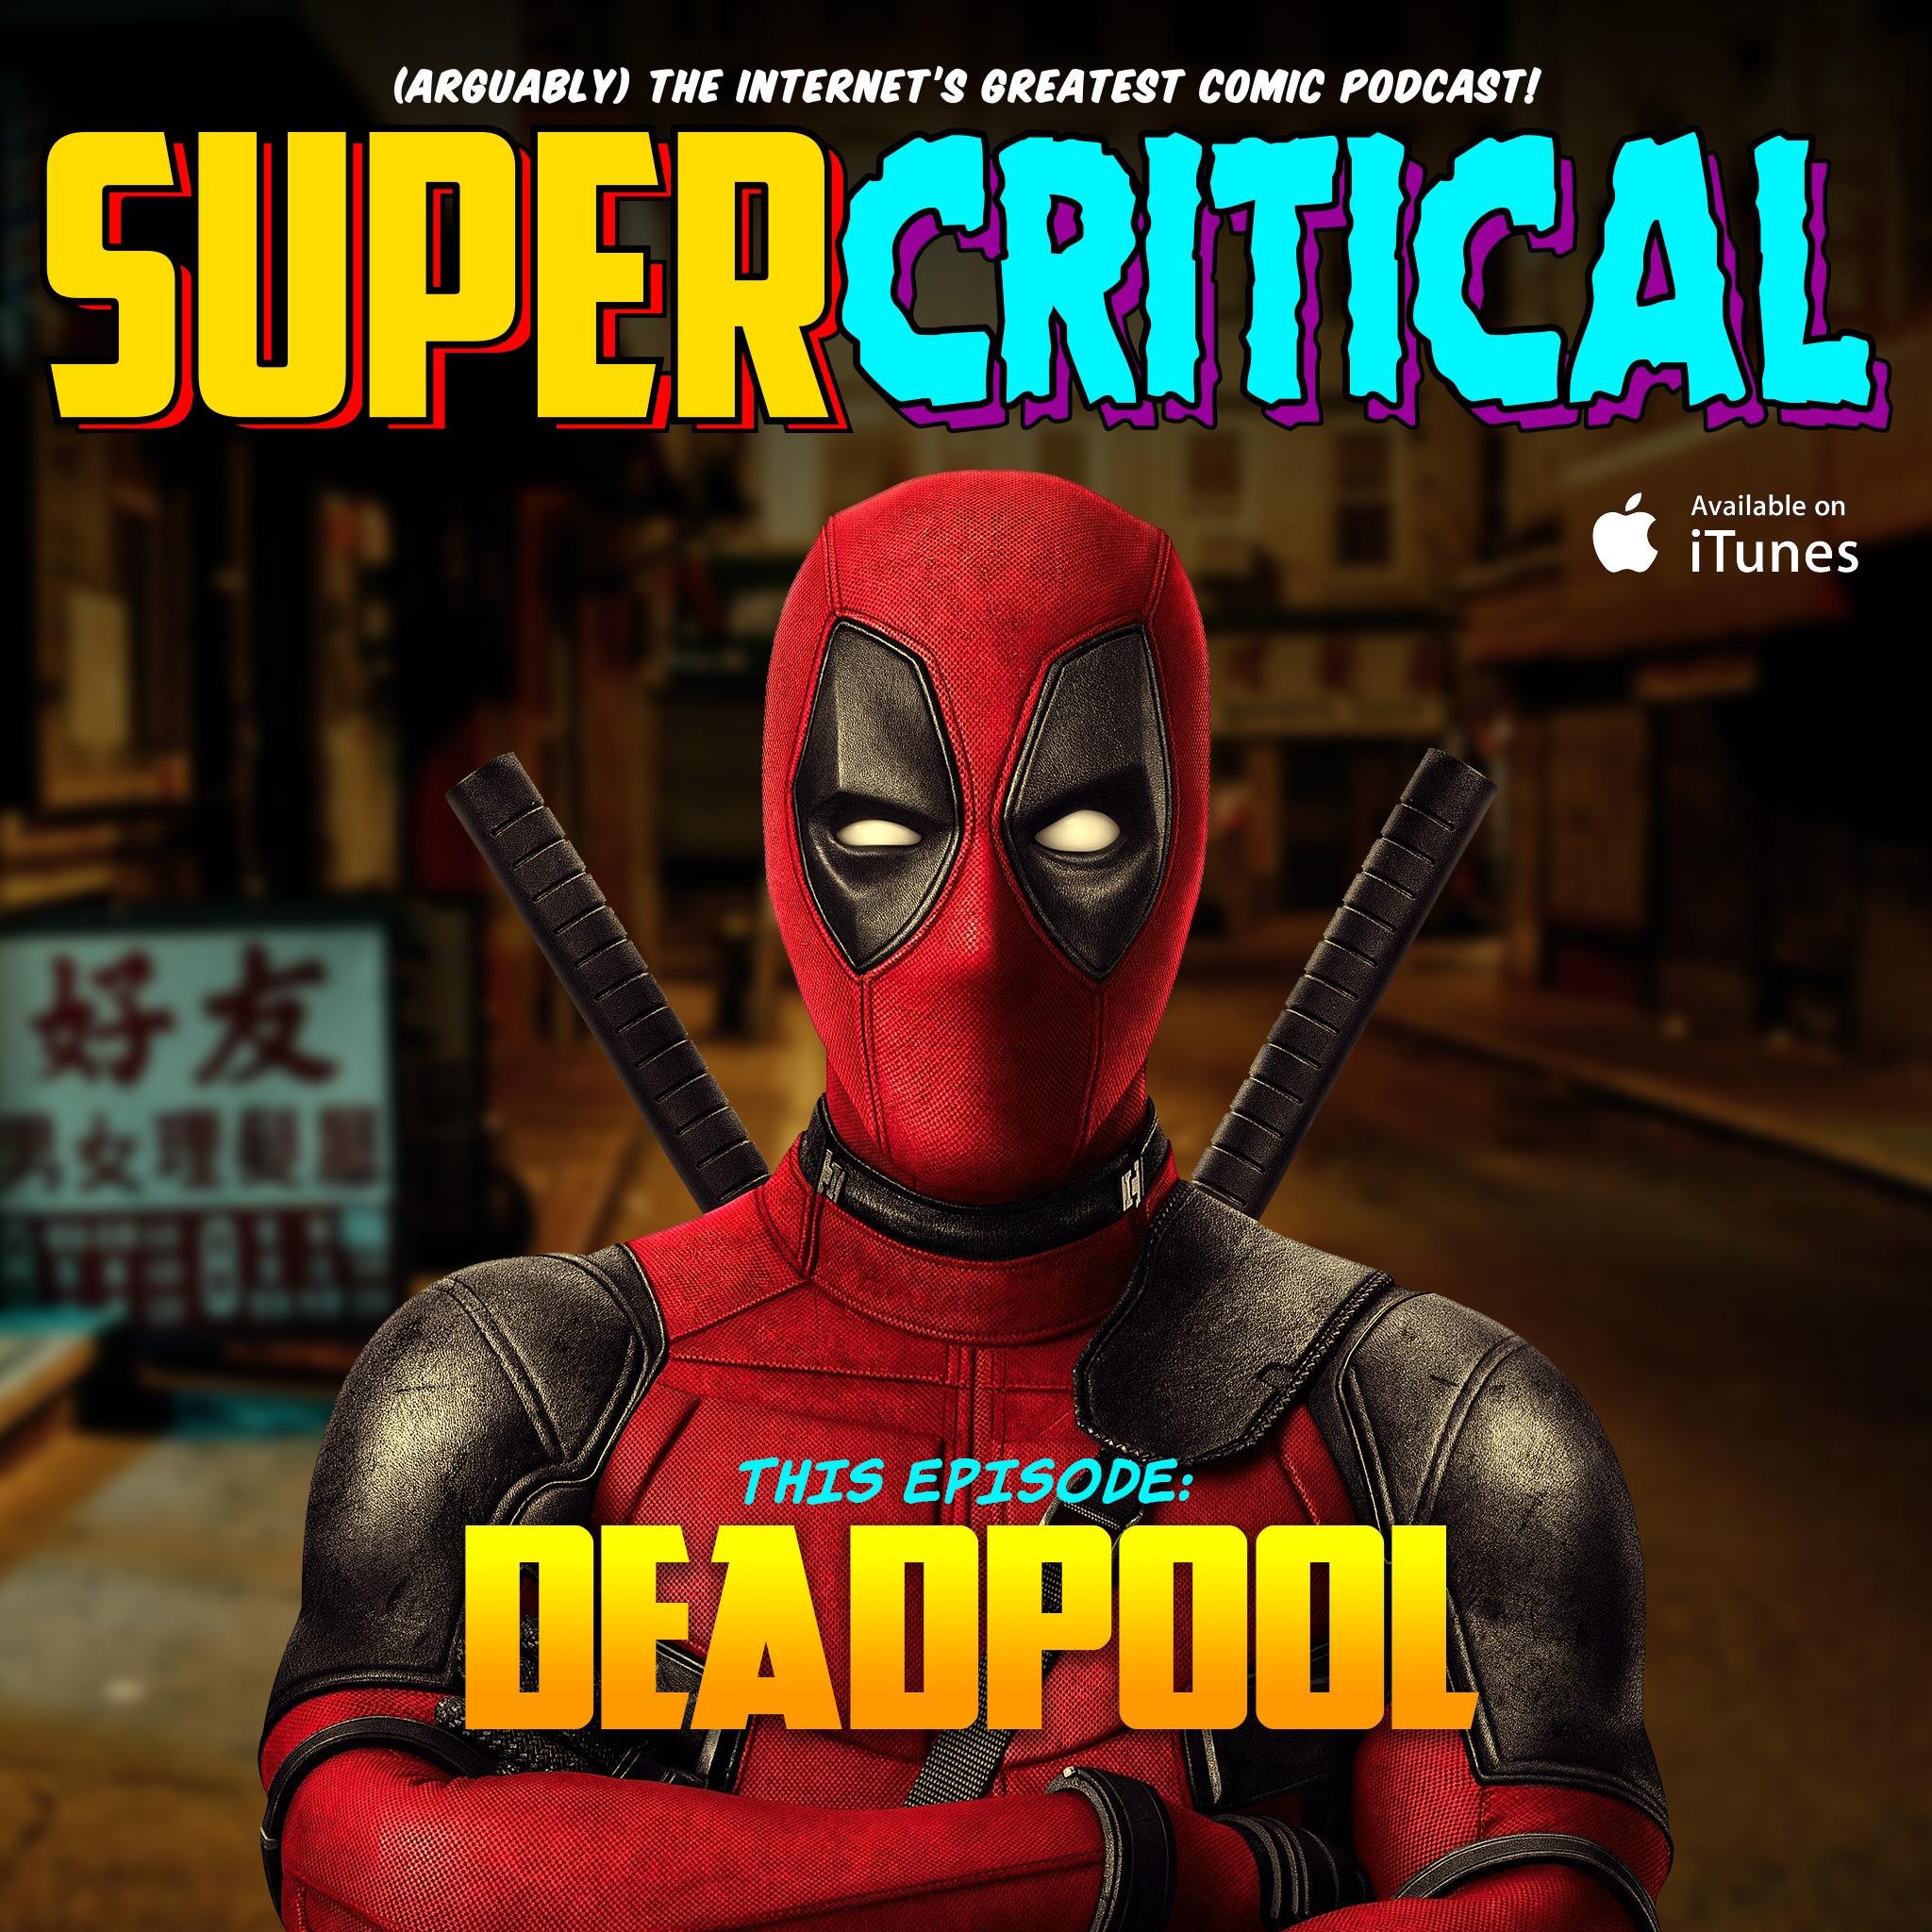 07_deadpool.jpg